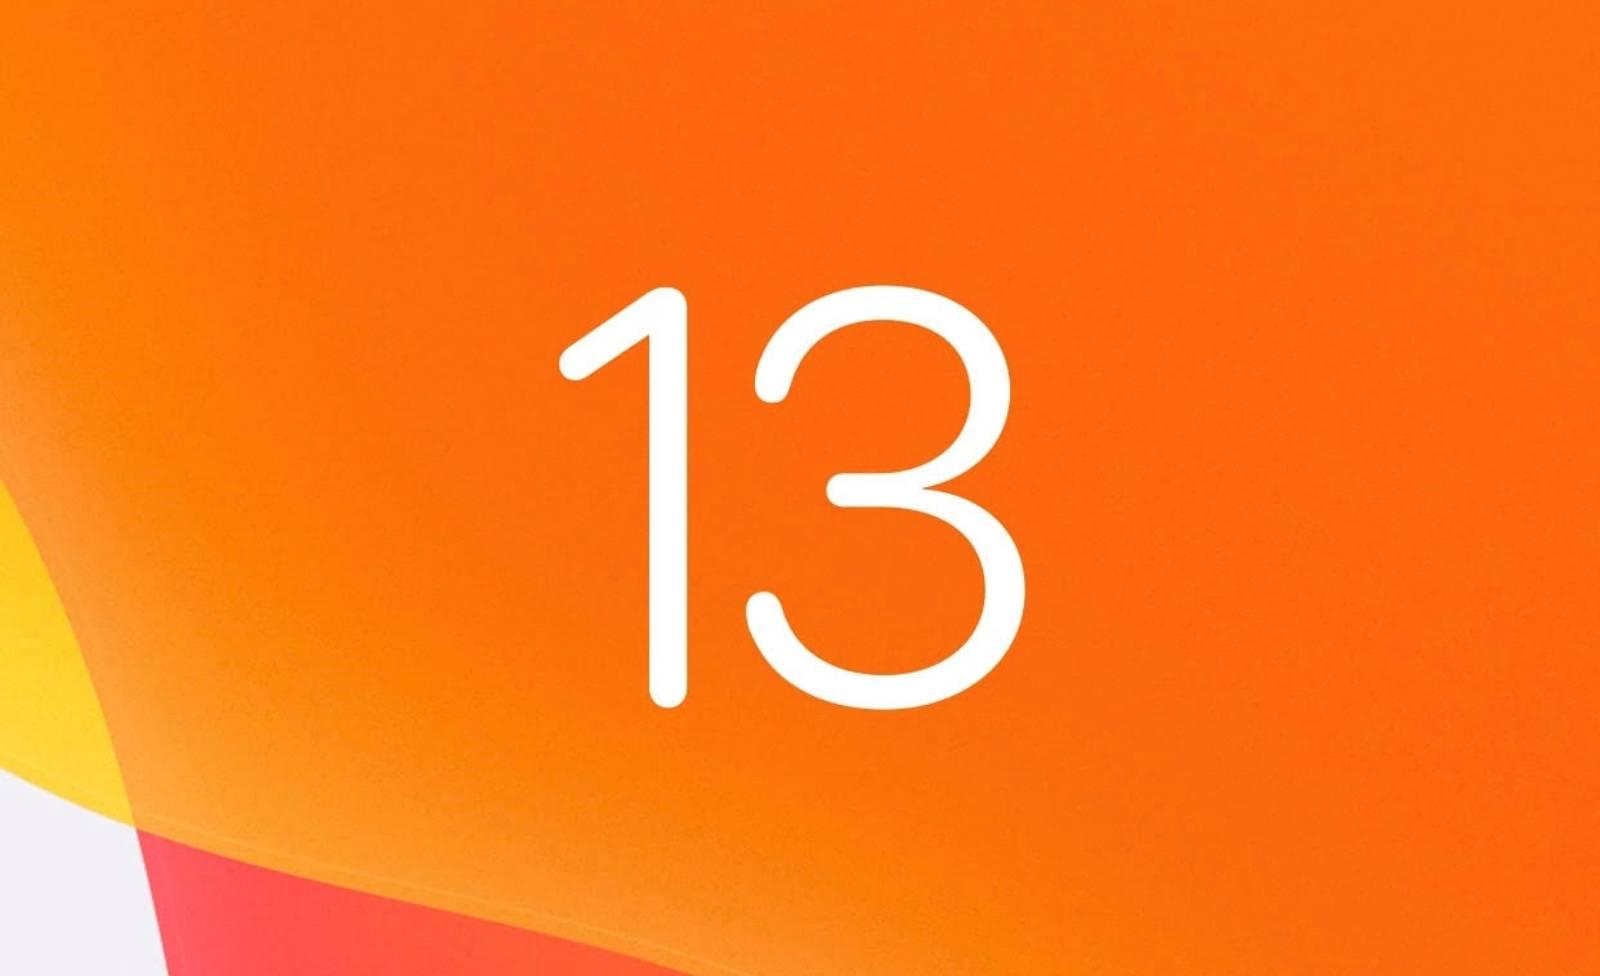 iOS 13 CONFIRMA un Nou Produs SURPRIZA de la Compania Apple